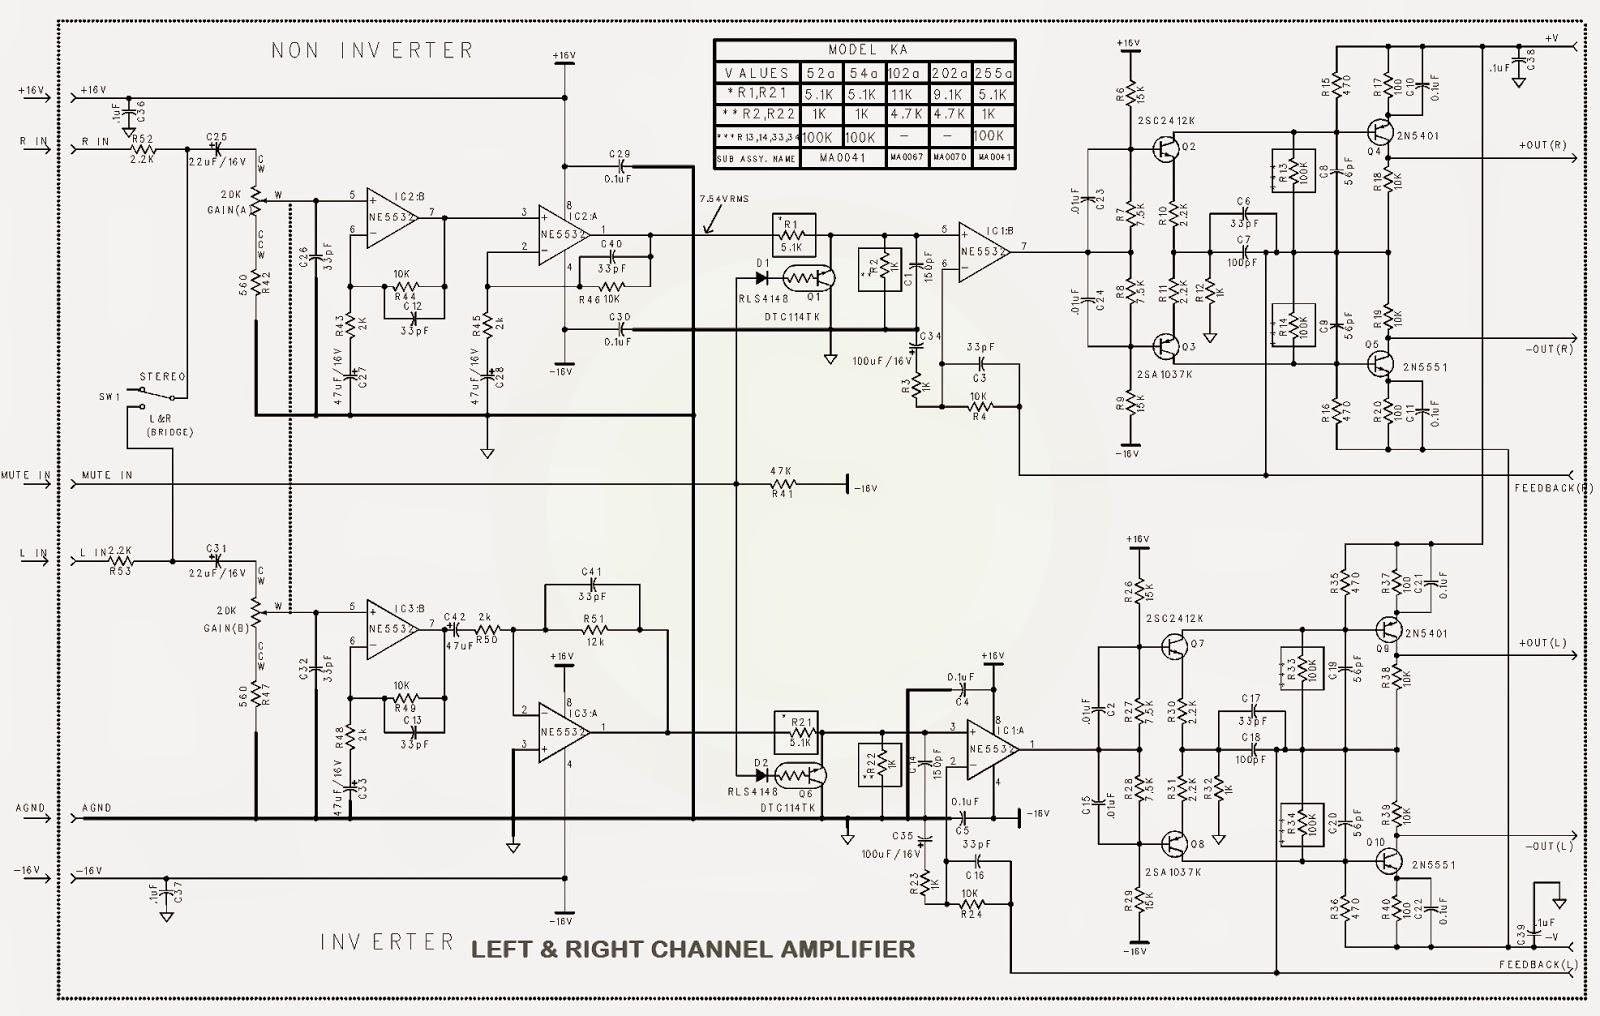 1988 mazda b2200 wiring diagram